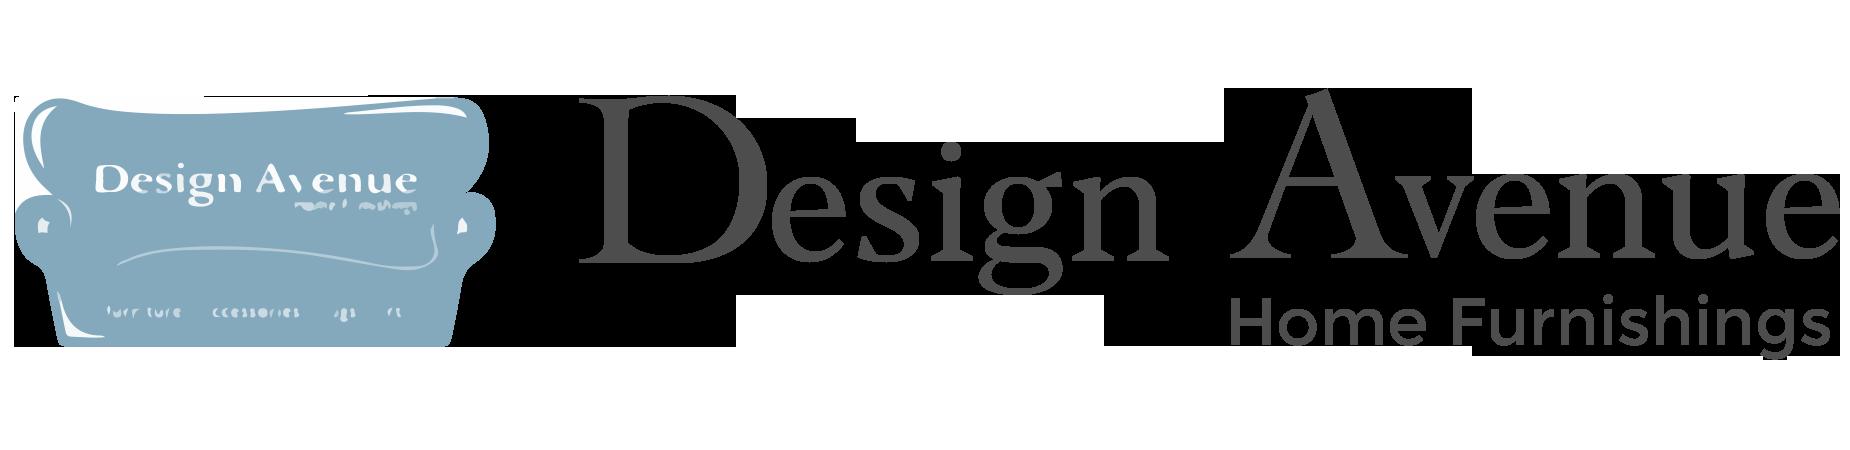 Asheville Furniture Design